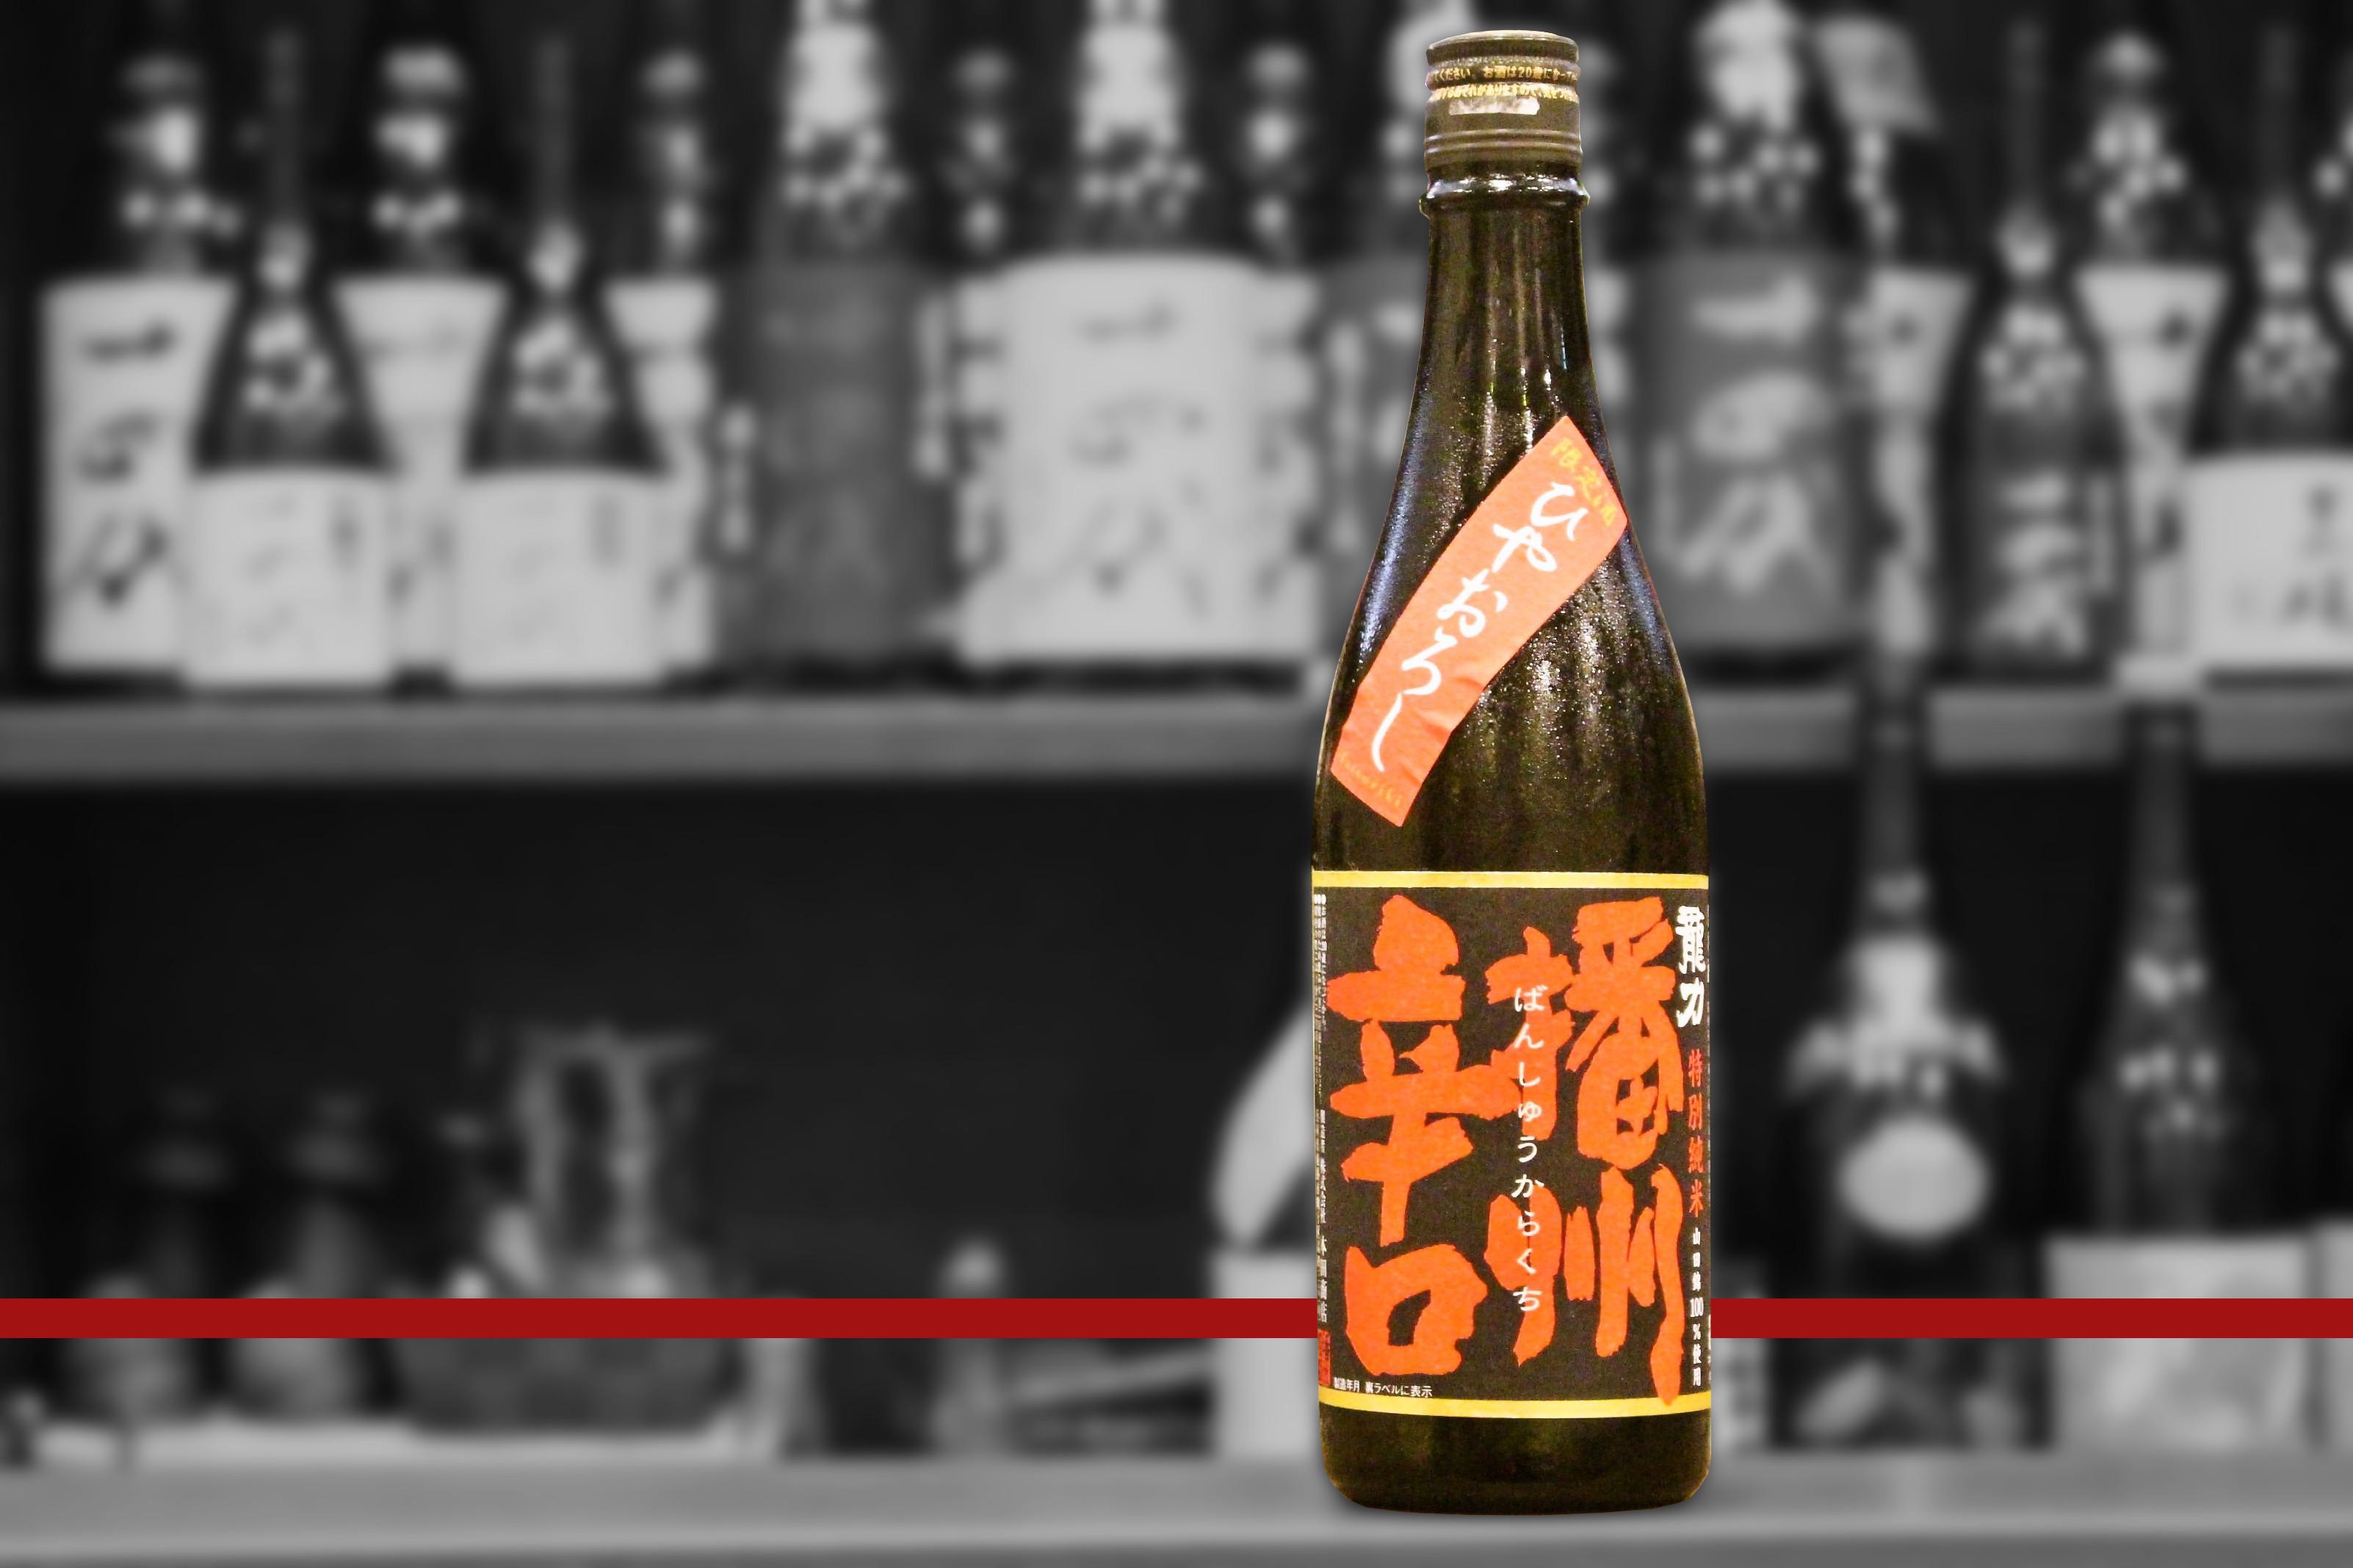 blog龍力特別純米播州辛口ひやおろし202109